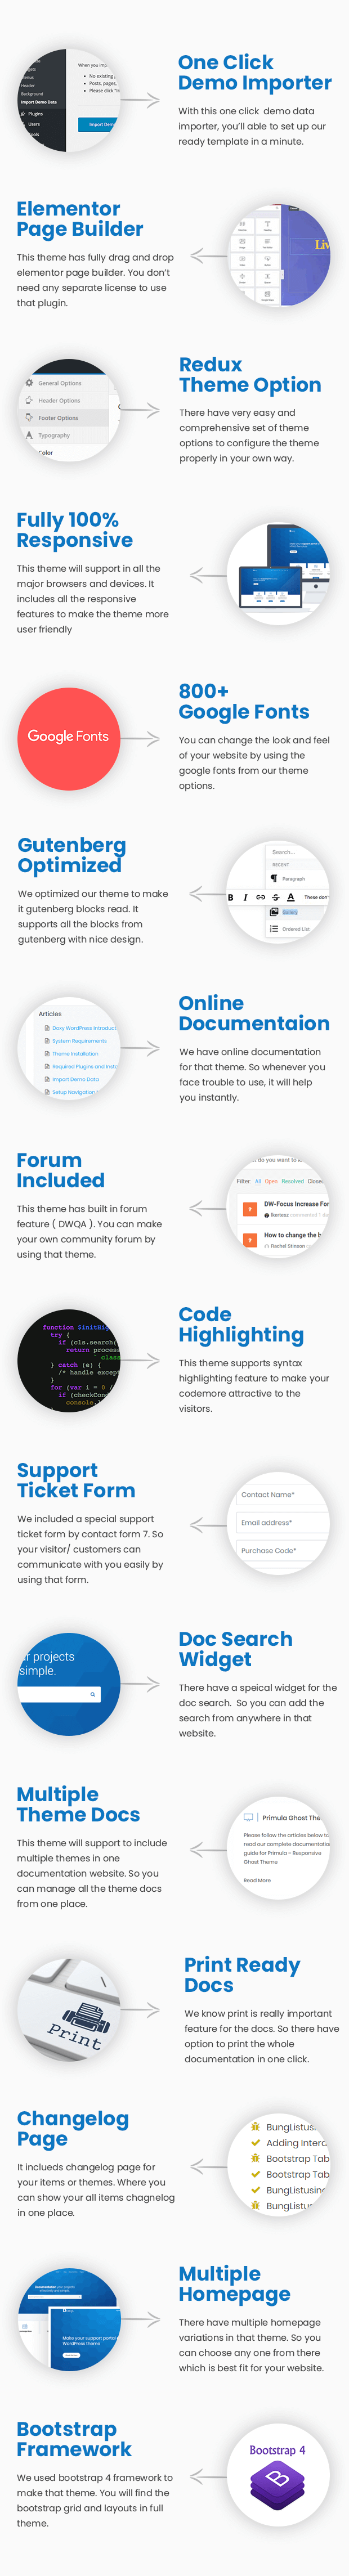 Doxy - Multi-Purpose Online Documentation, Knowledge Base WordPress Theme - 1